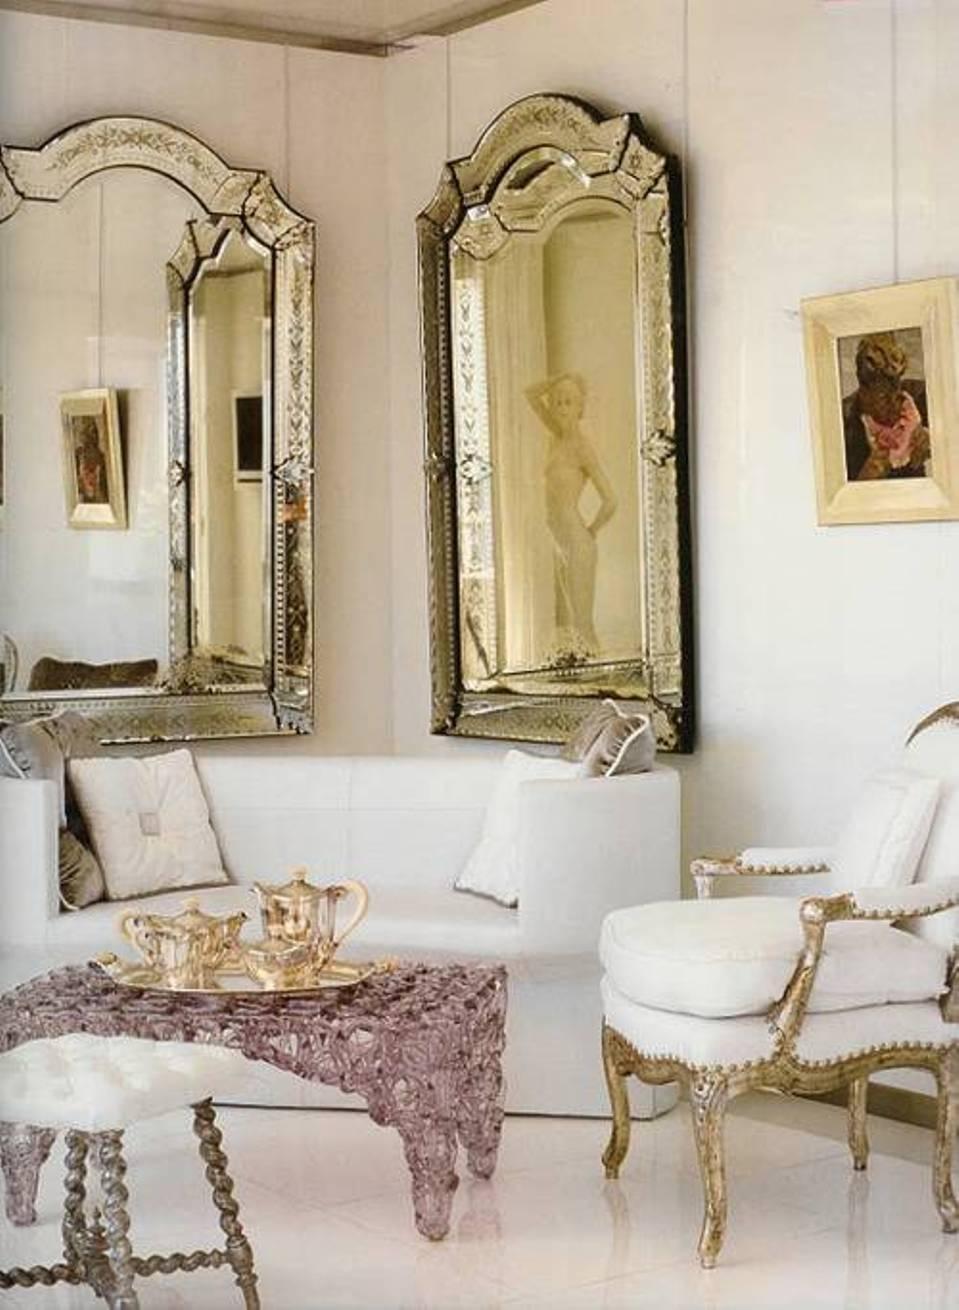 Antique Decorative Wall Mirrors Imposing Design Antique Wall For Long Decorative Mirror (View 12 of 15)